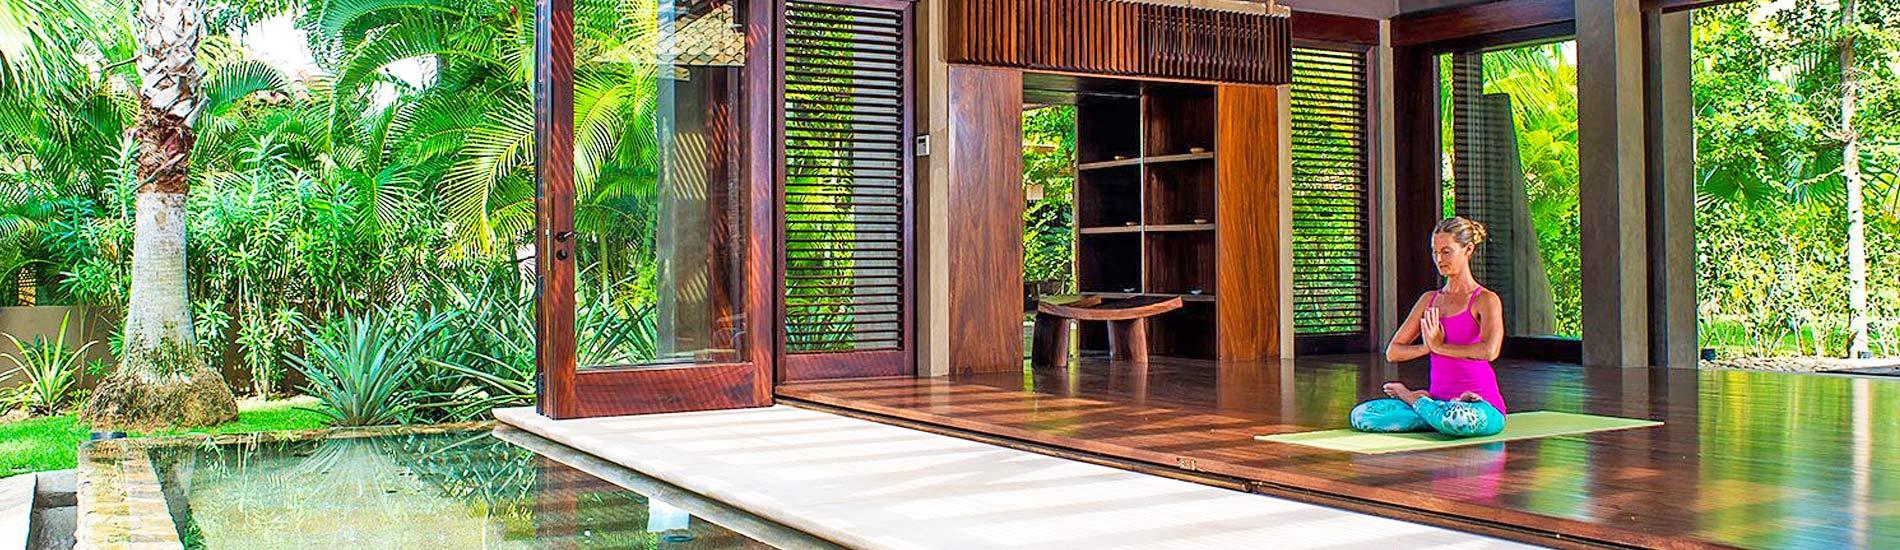 villas for yoga & wellness in mexico